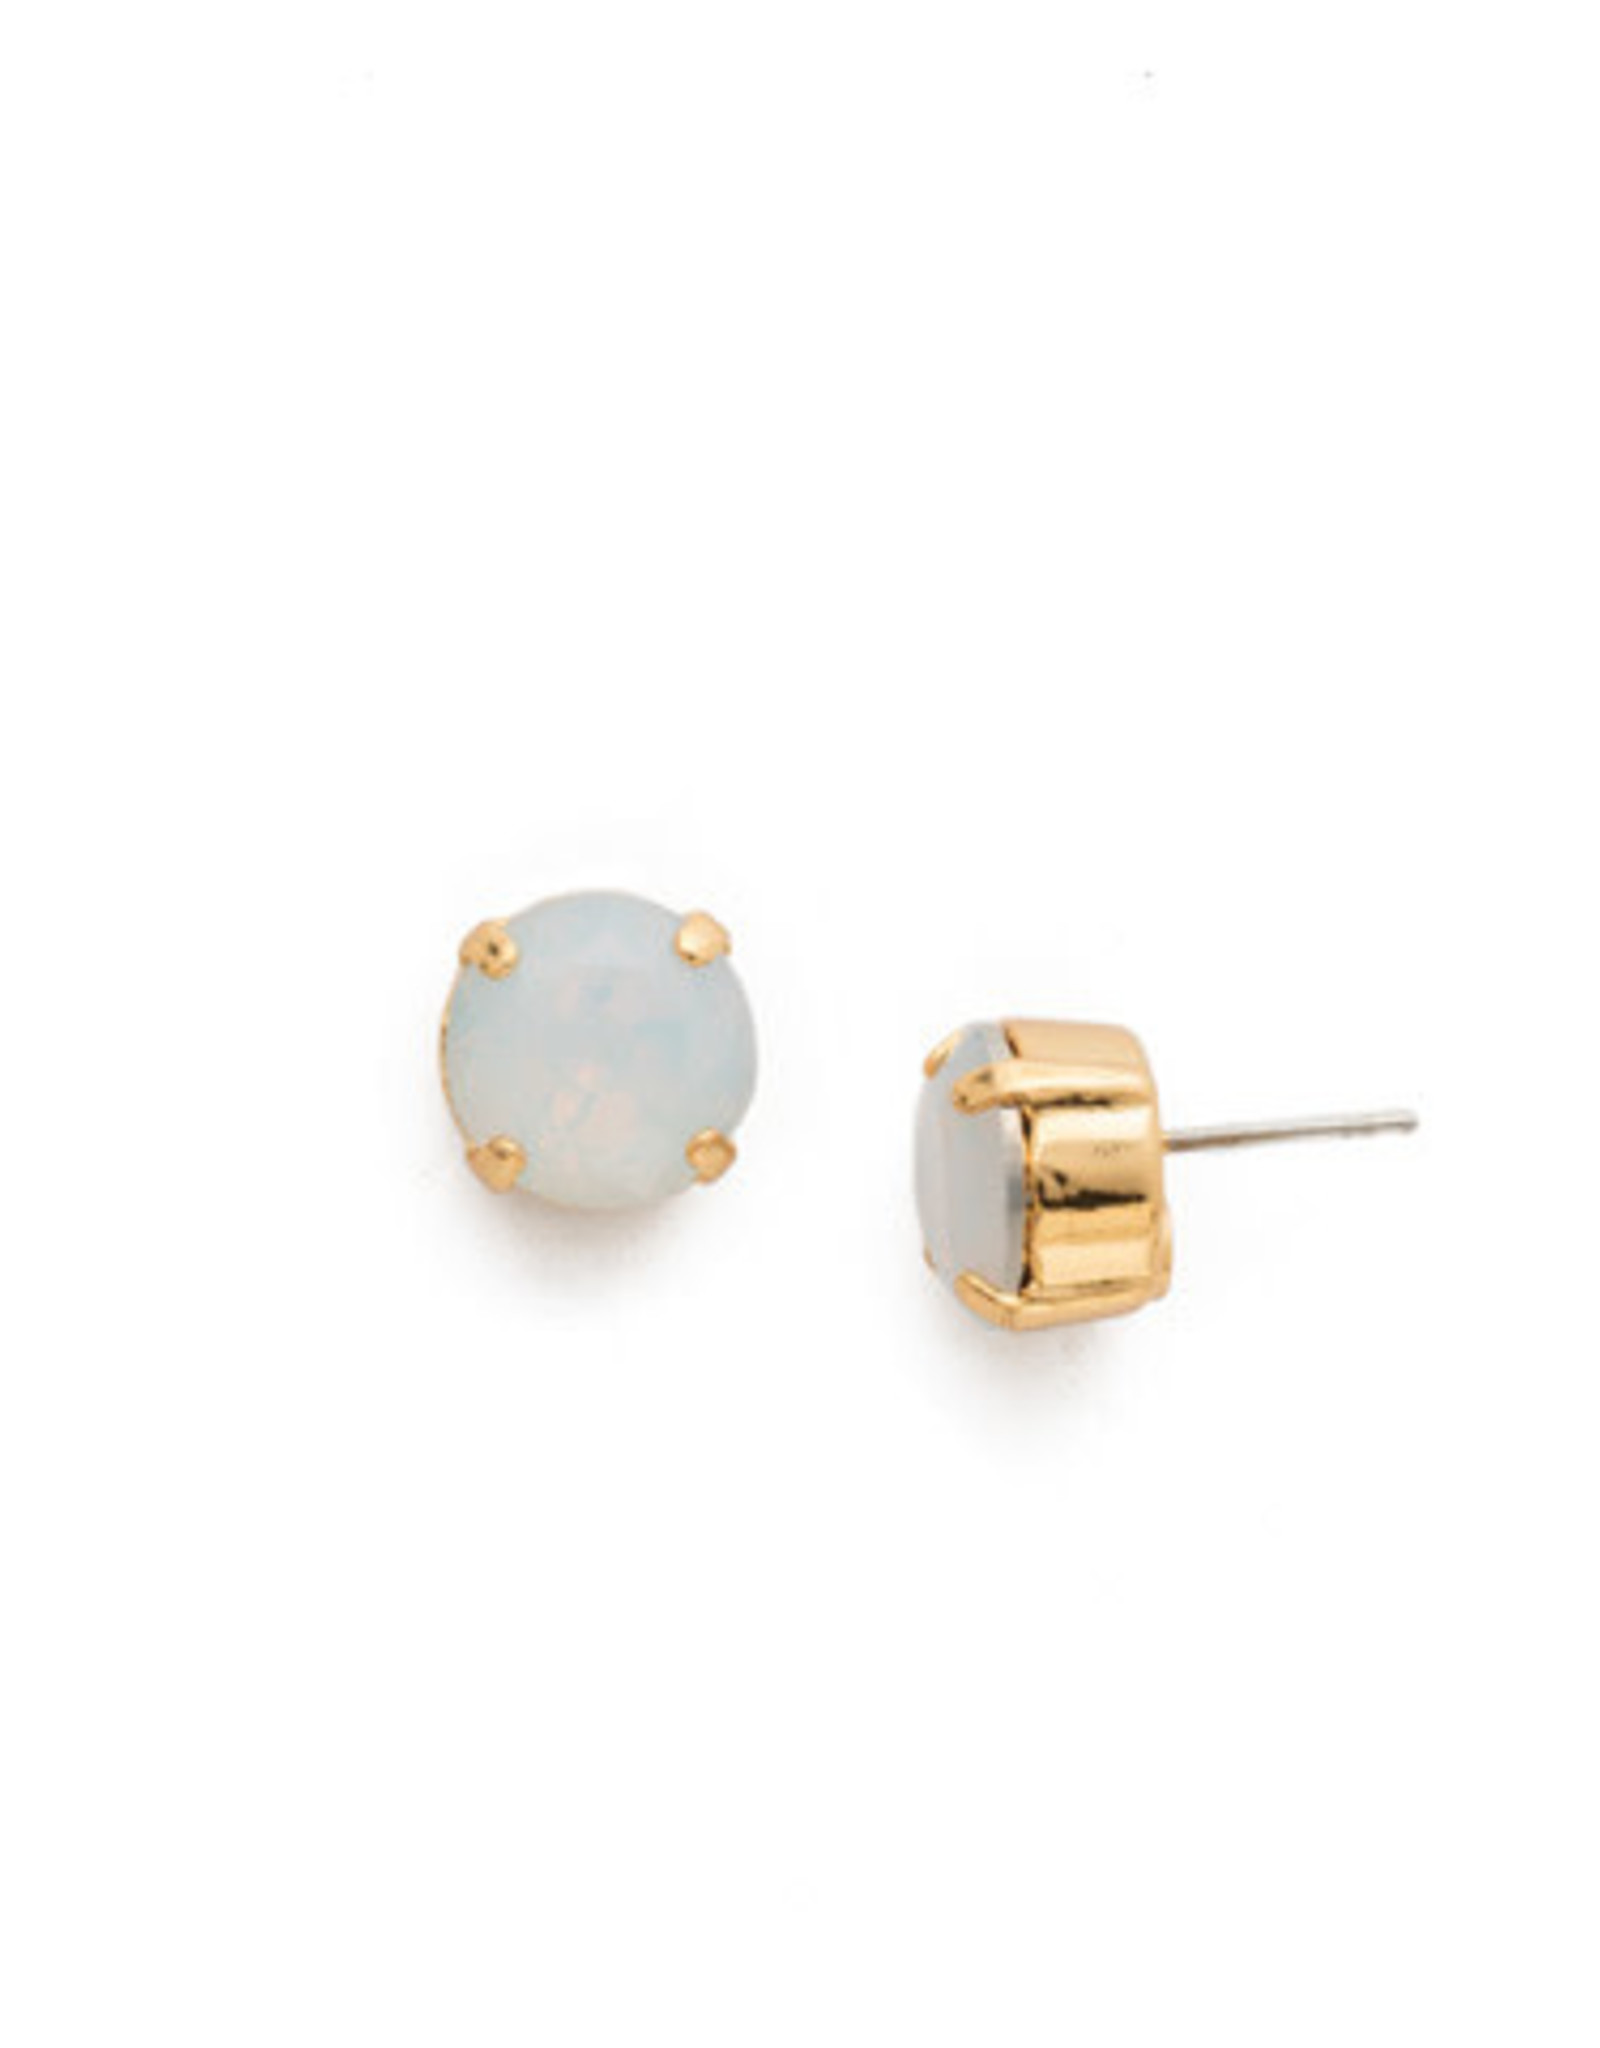 Sorrelli Ear BG/White Opal/Ess